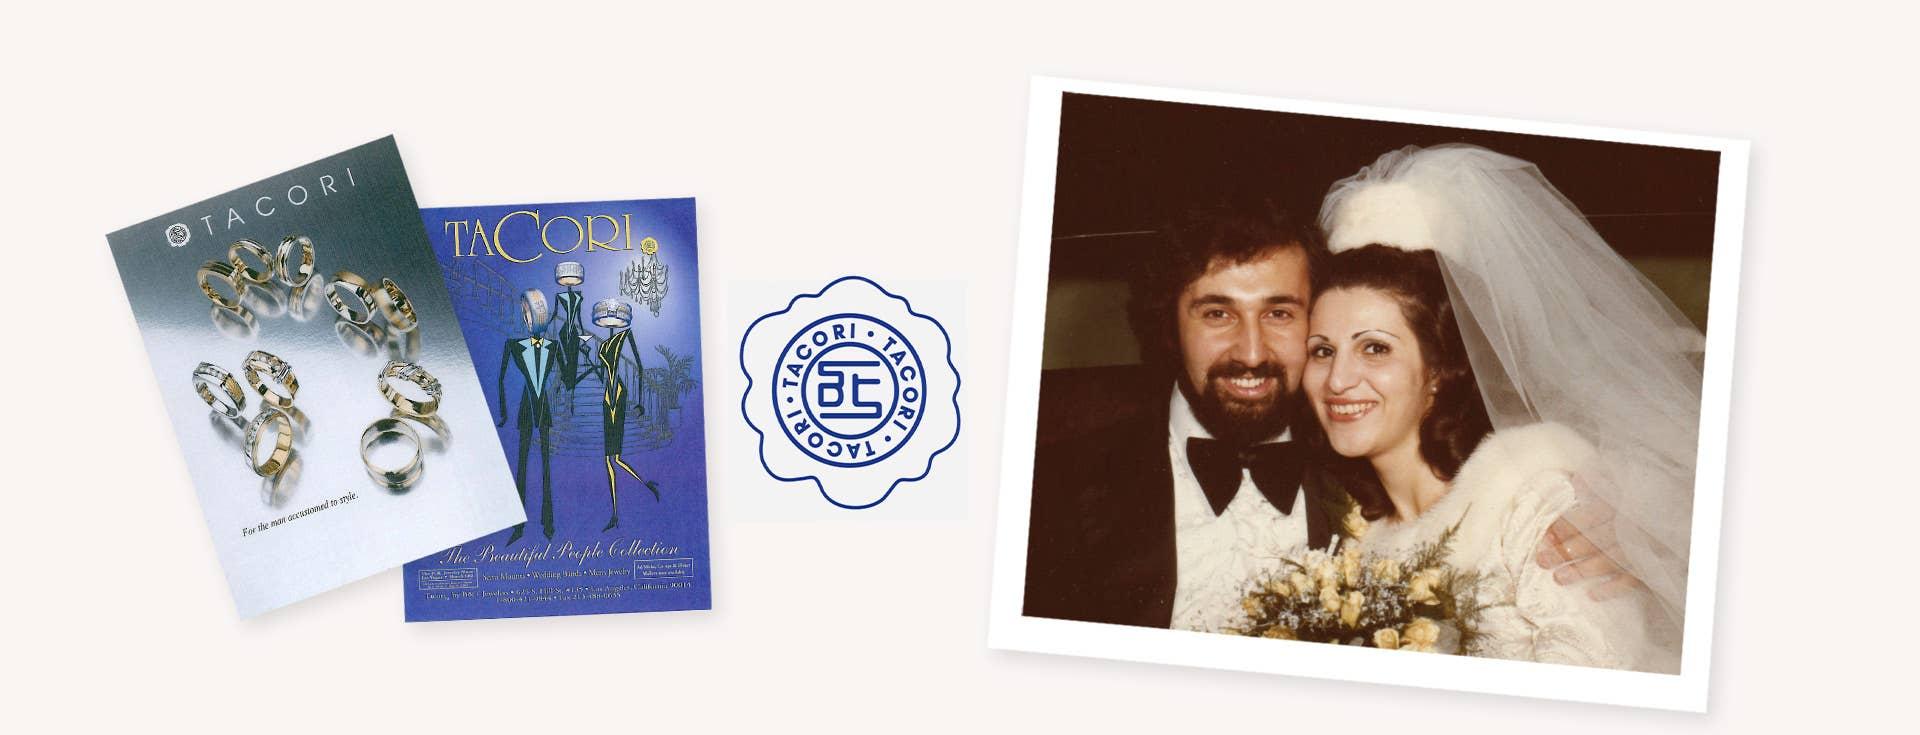 Old Tacori Print Ads, Tacori Logo, and Haig and Gilda Wedding photo